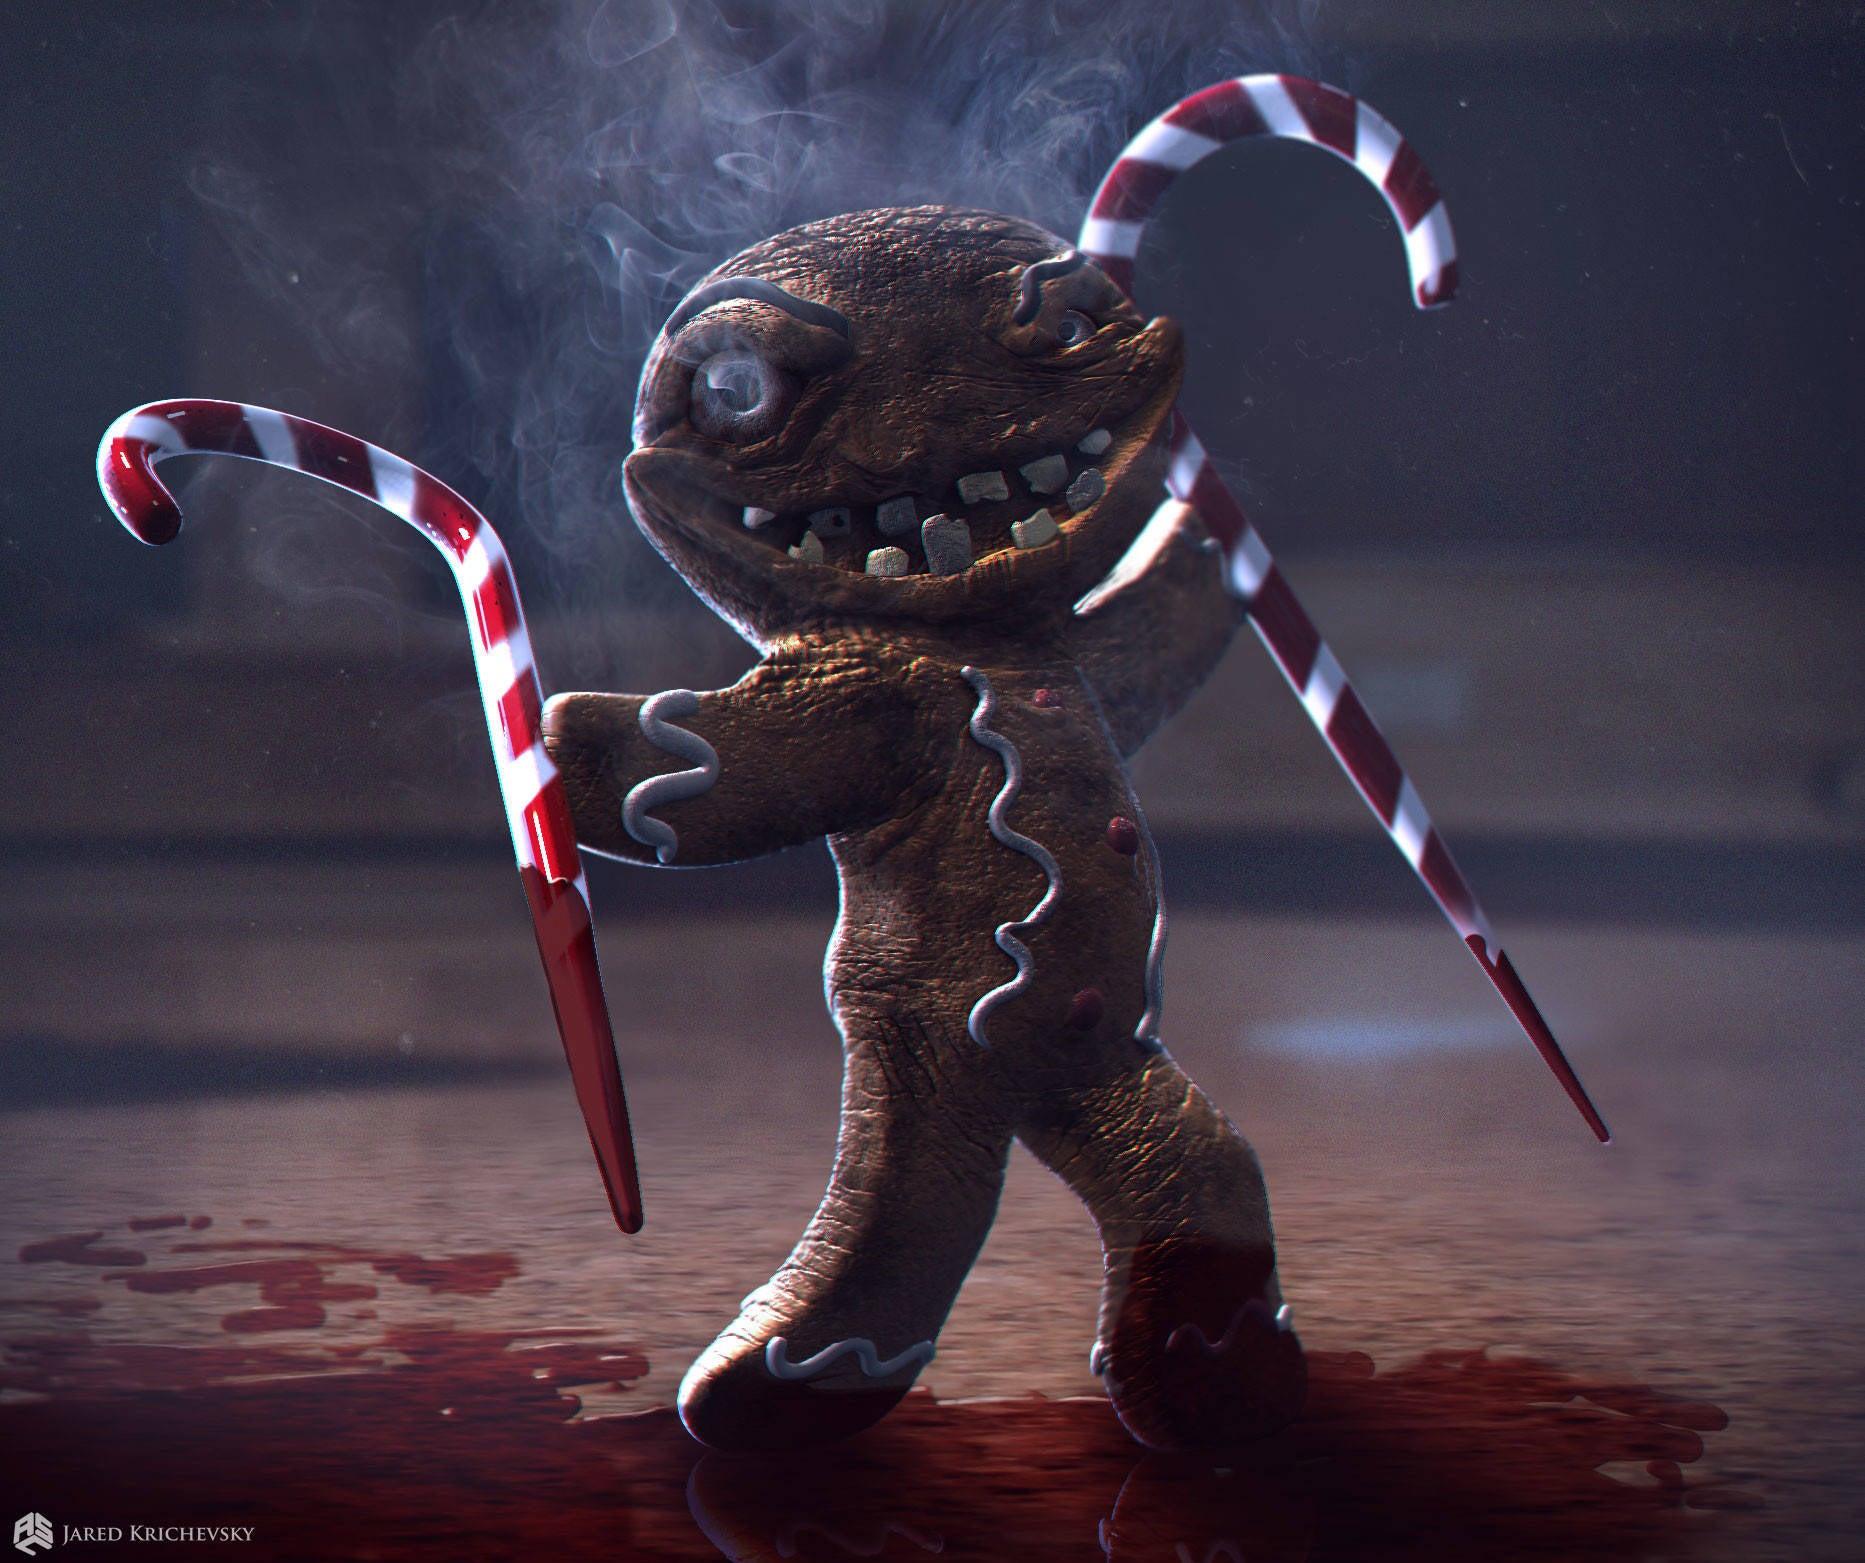 jared-krichevsky-gingerbread3